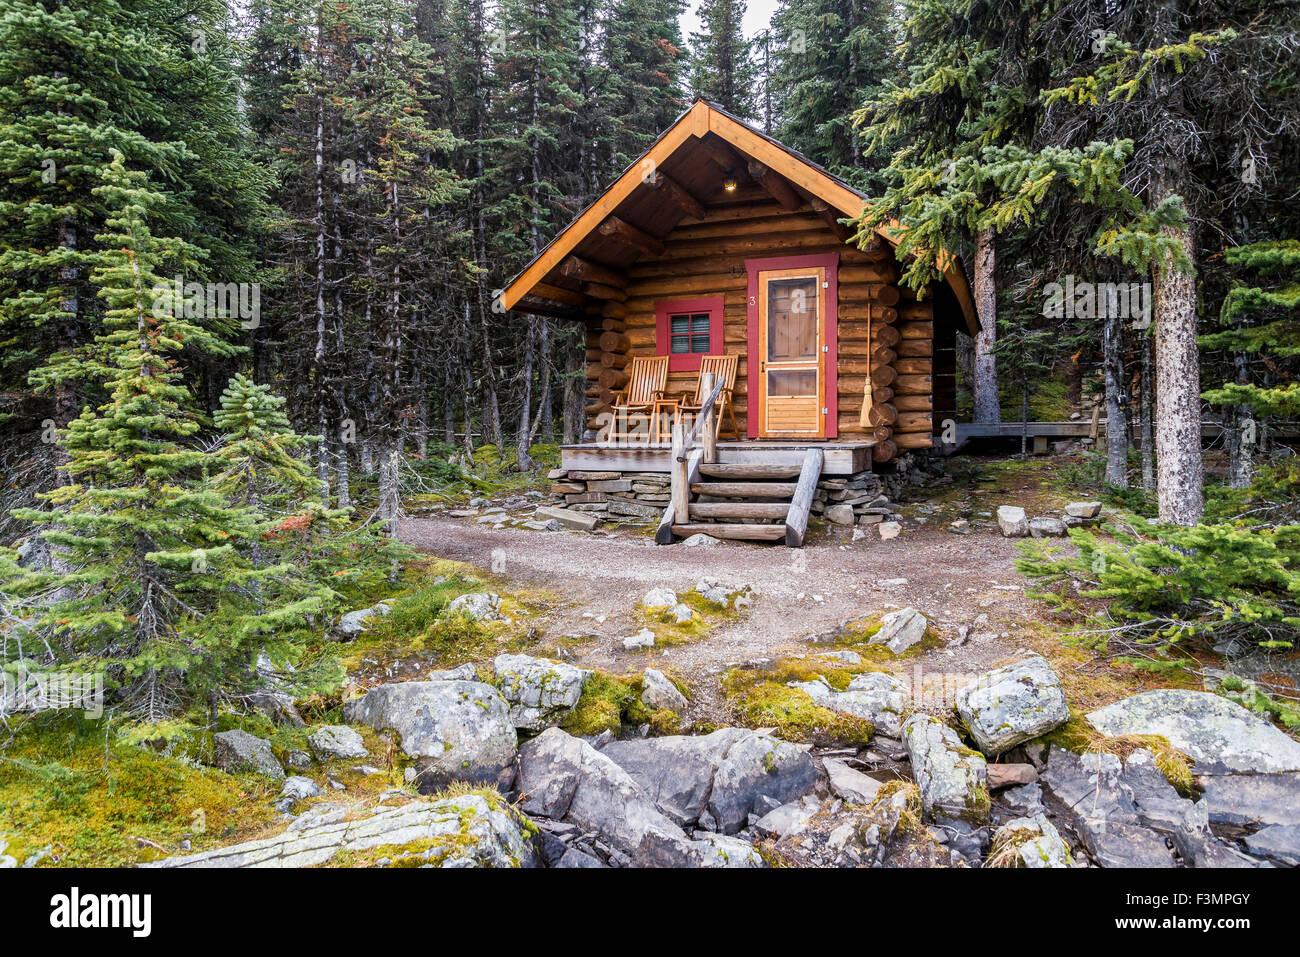 Cabin, Lake O'Hara, Yoho National Park, British Columbia, Canada - Stock Image